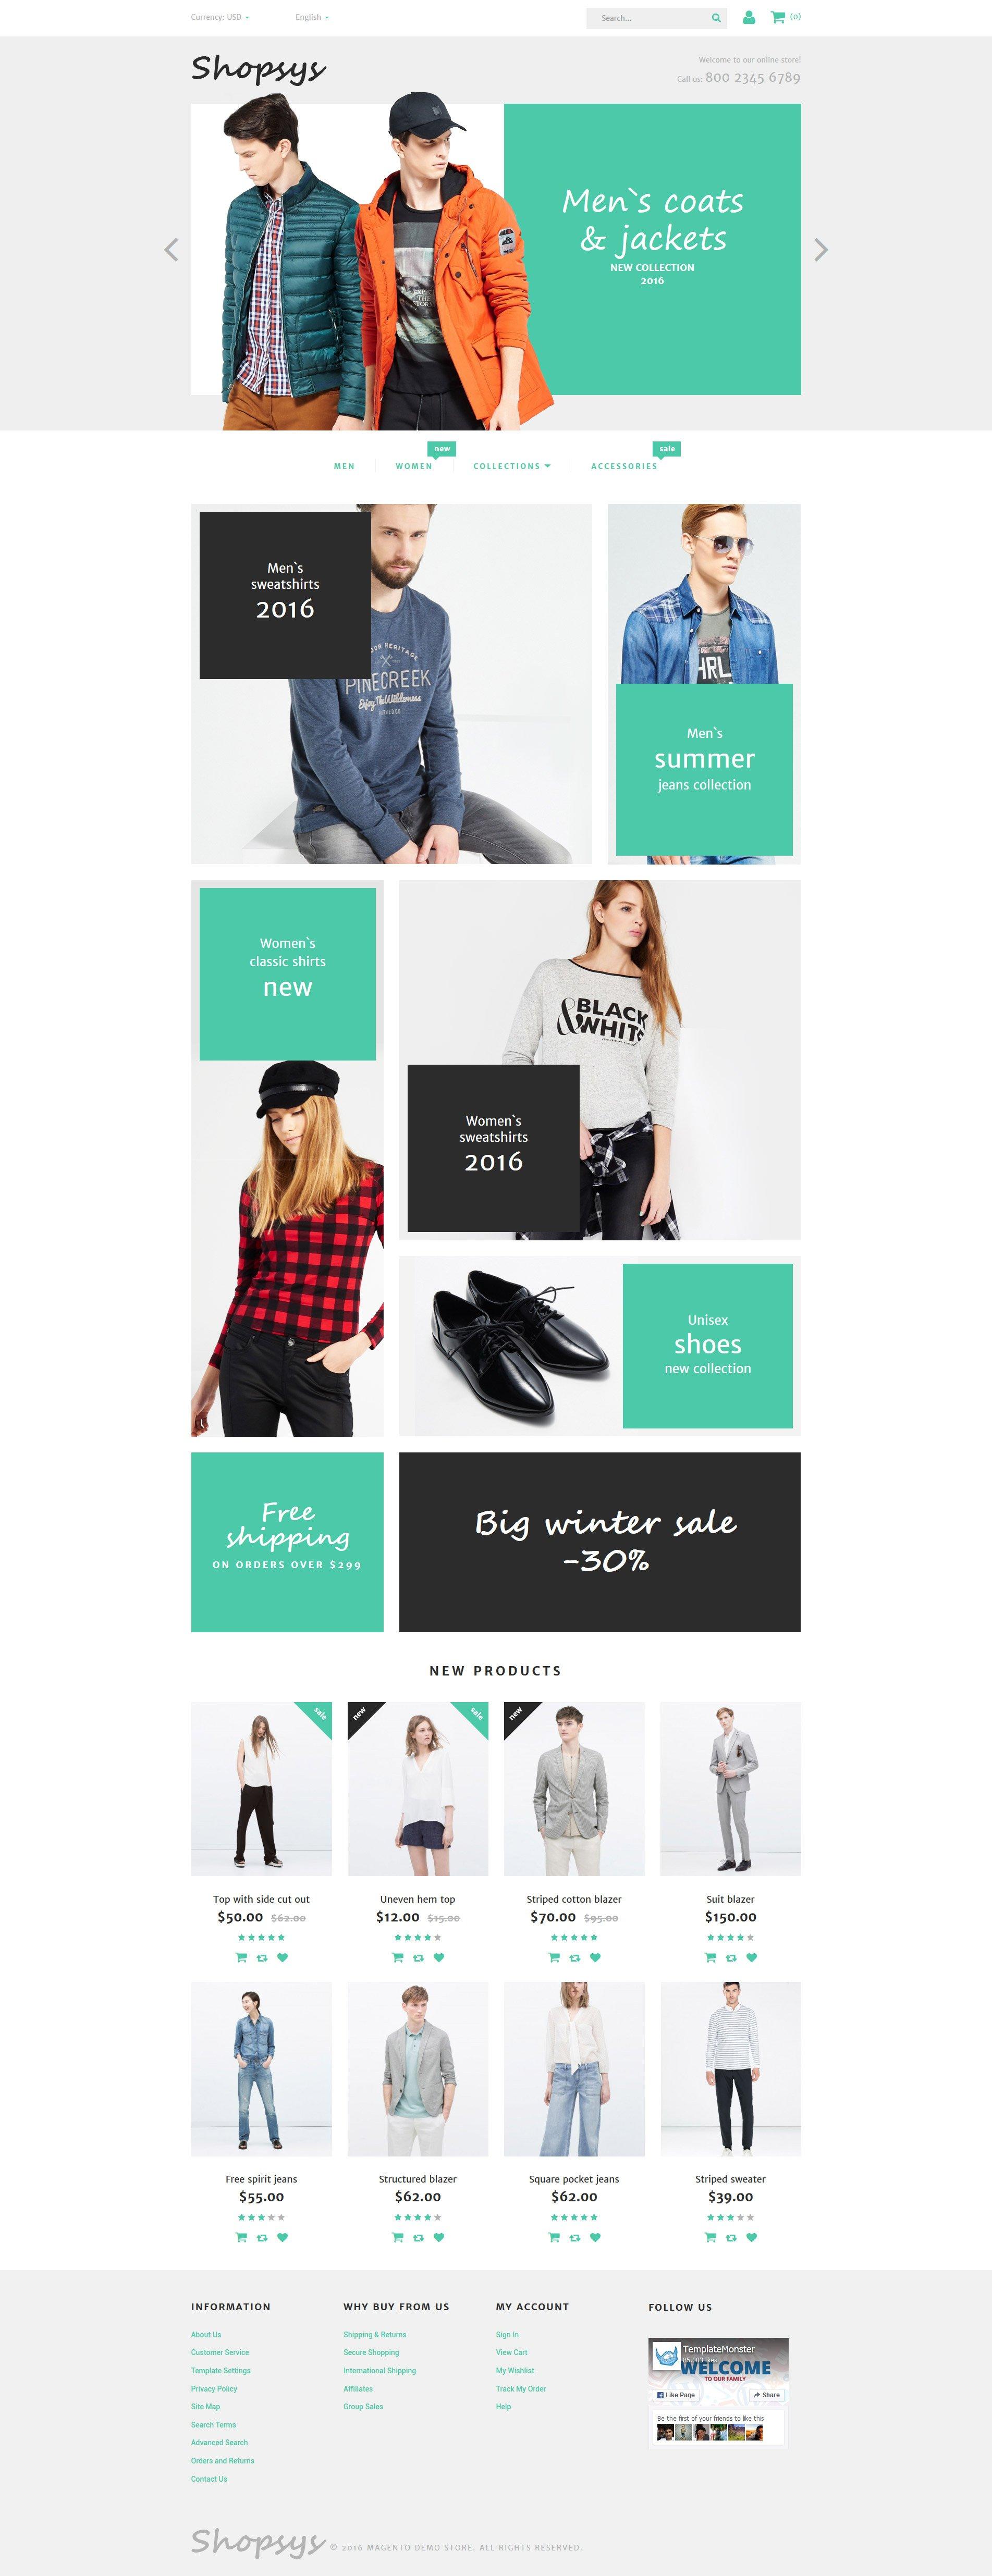 Shopsys - Designer Clothing Magento Theme - screenshot